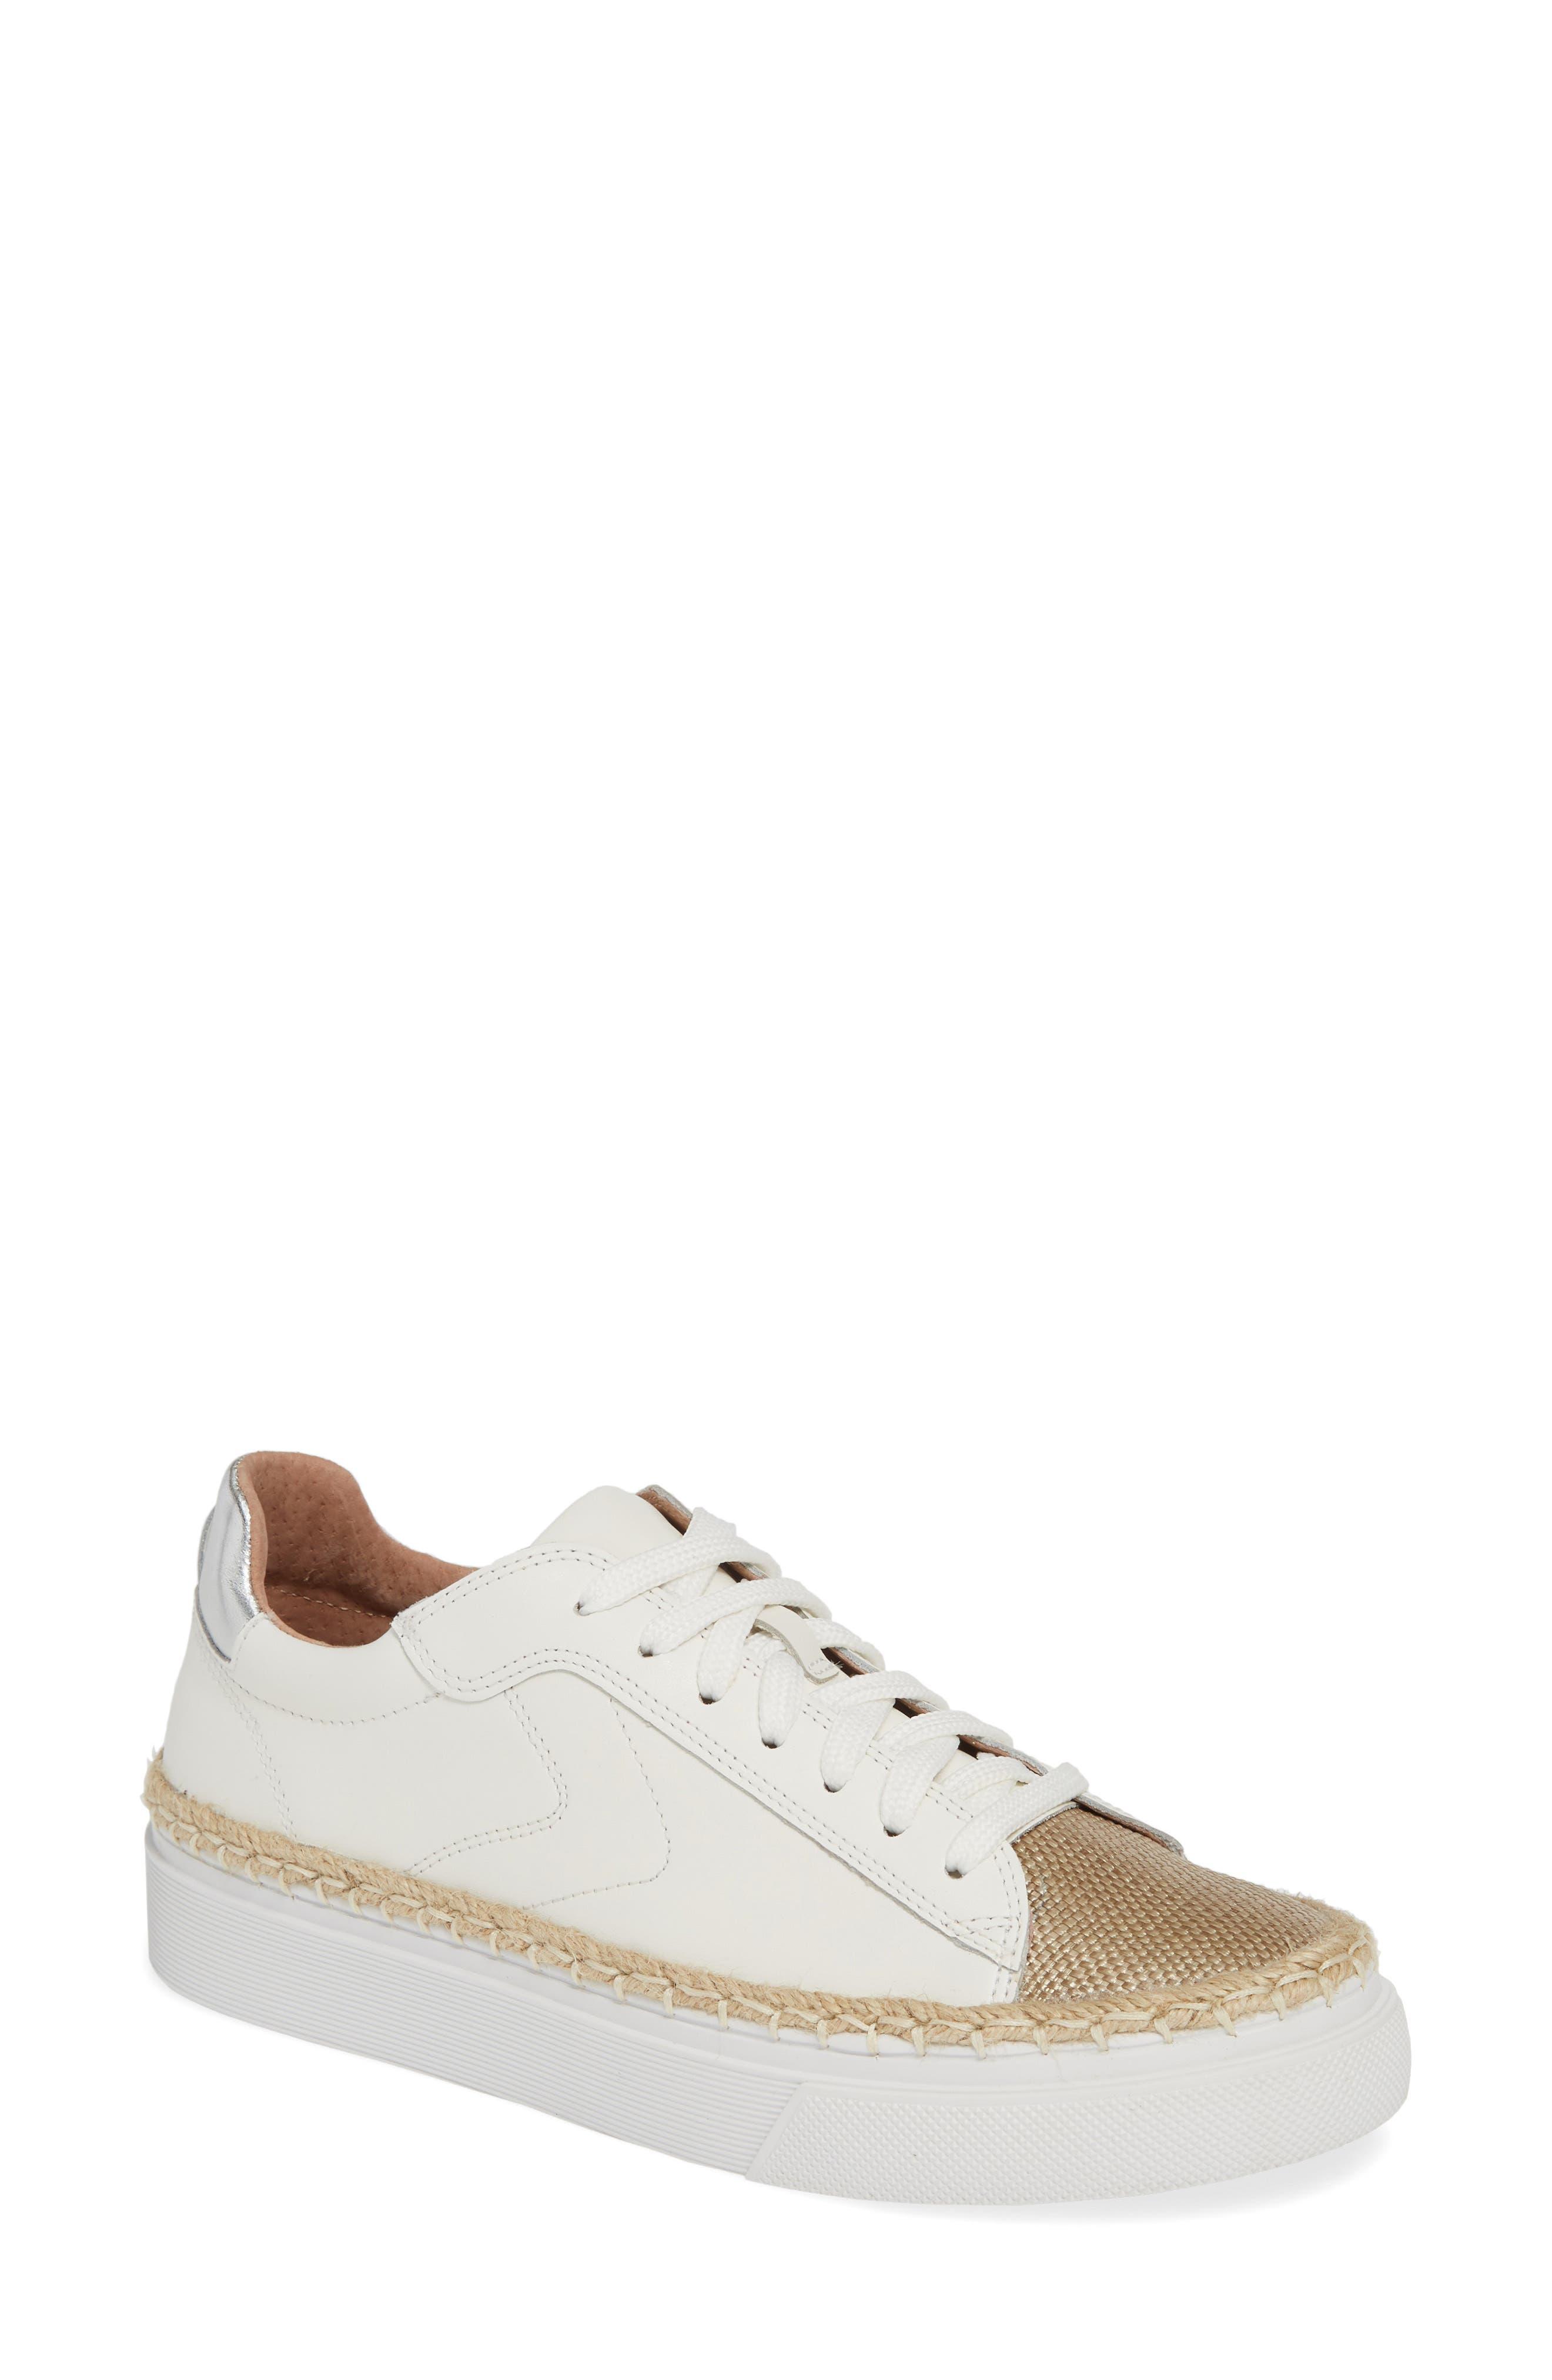 CASLON<SUP>®</SUP> Caleb Platform Sneaker, Main, color, WHITE LEATHER/ RAFFIA